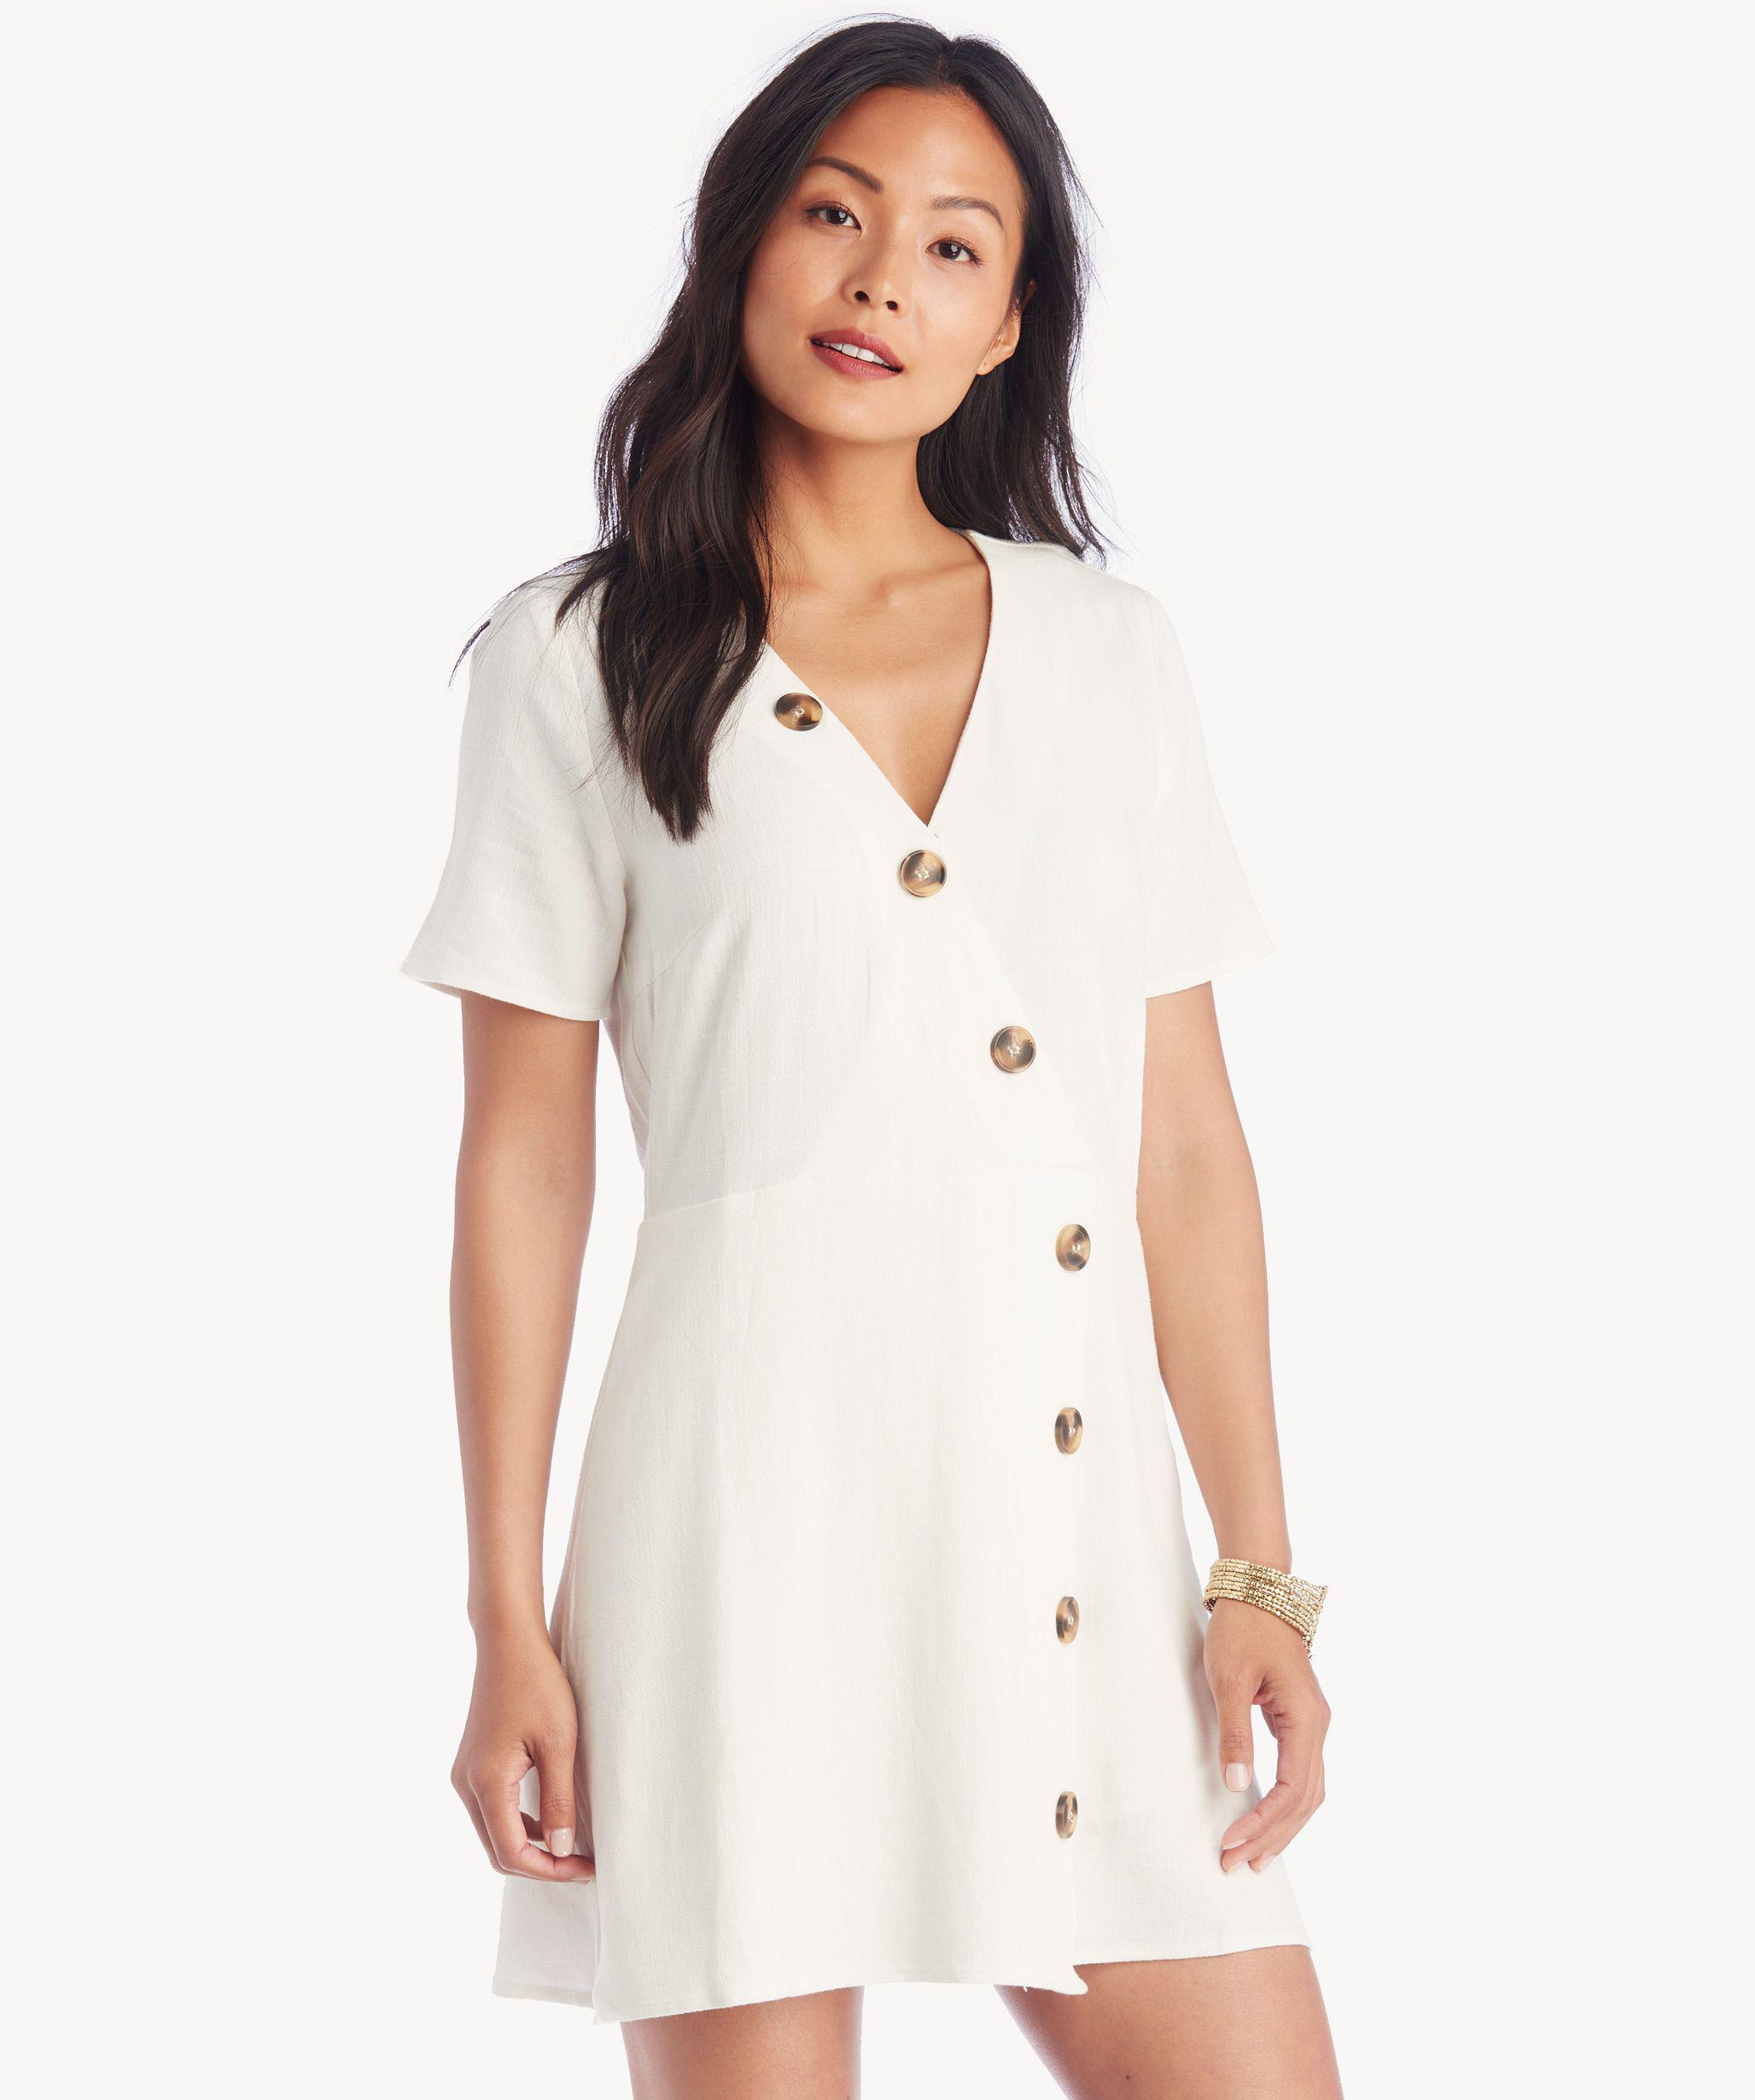 6d5d592c574 Lyst - Moon River Asymmetrical Button Dress in White